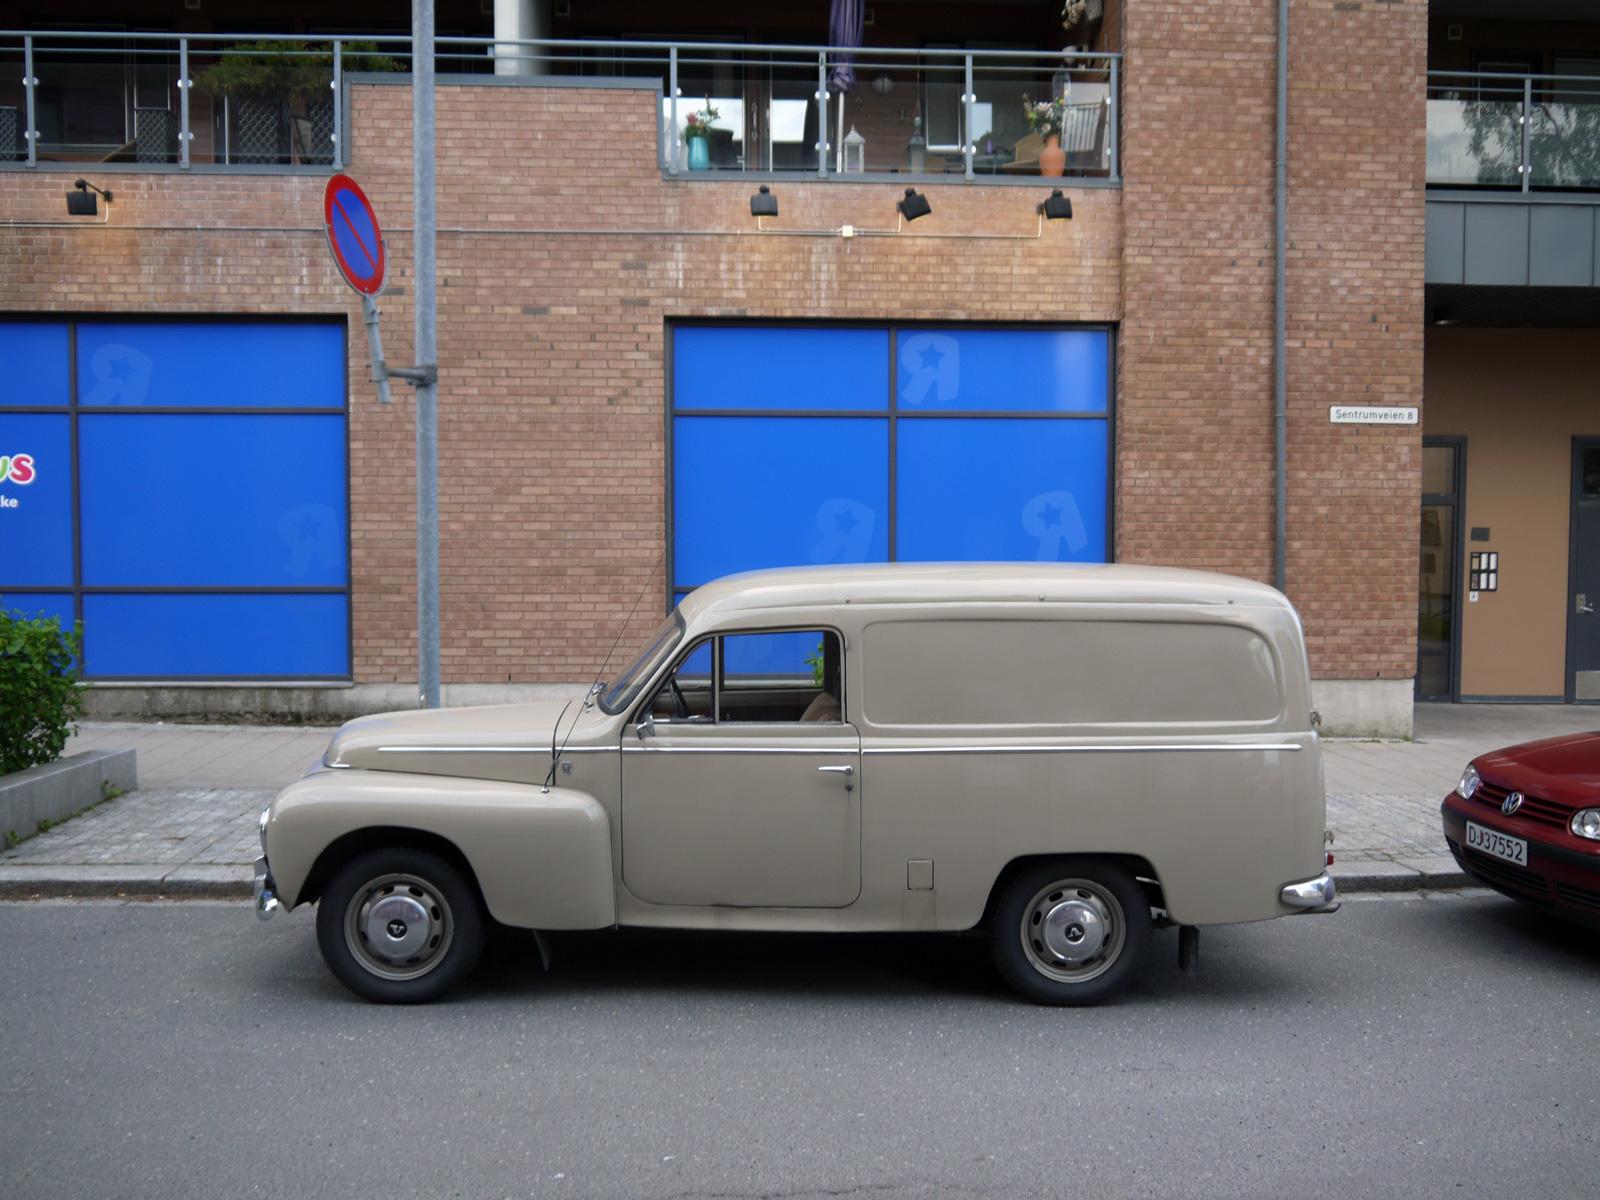 1968 Volvo Duett 210 Classic cars van Oslo